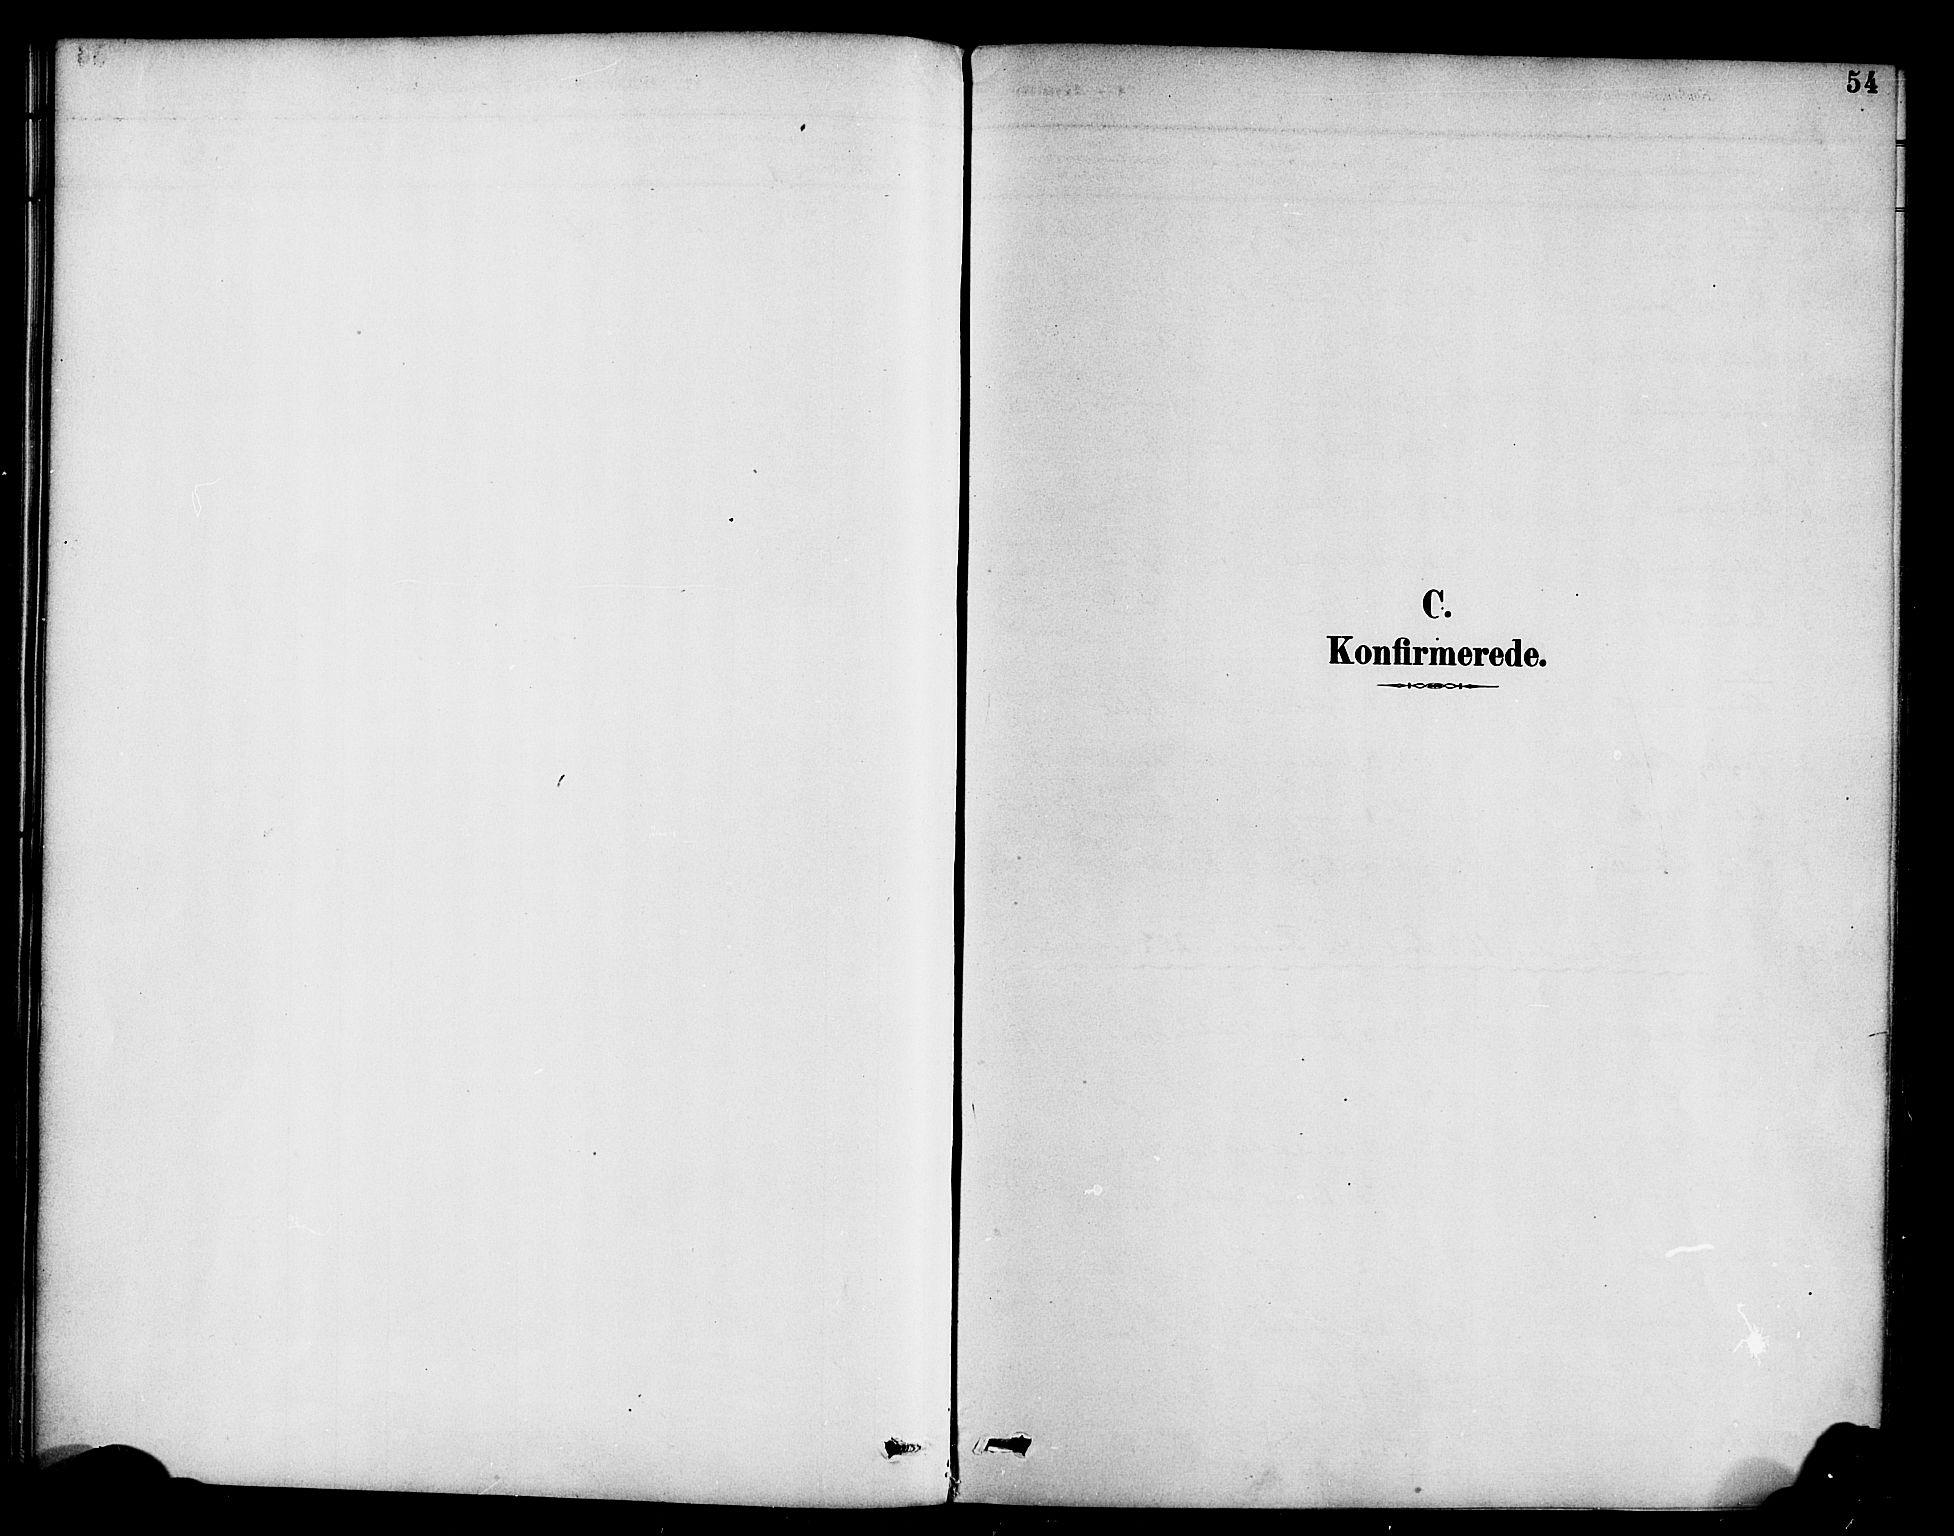 SAB, Hyllestad Sokneprestembete, Ministerialbok nr. B 1, 1886-1904, s. 54